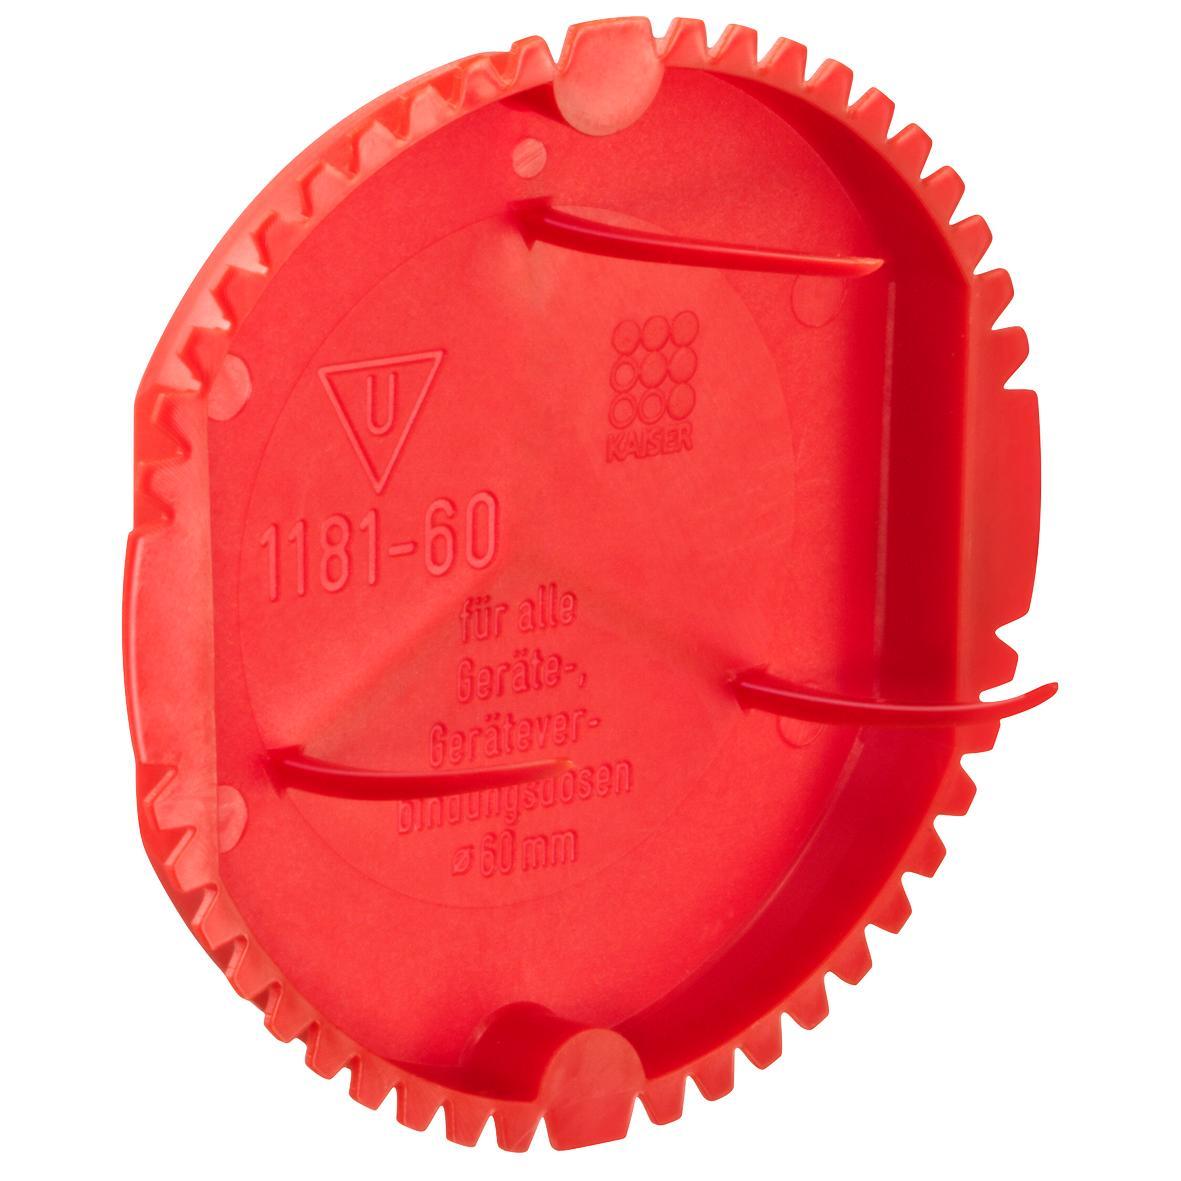 Kaiser Signaldeckel rot 60mm  1181-60